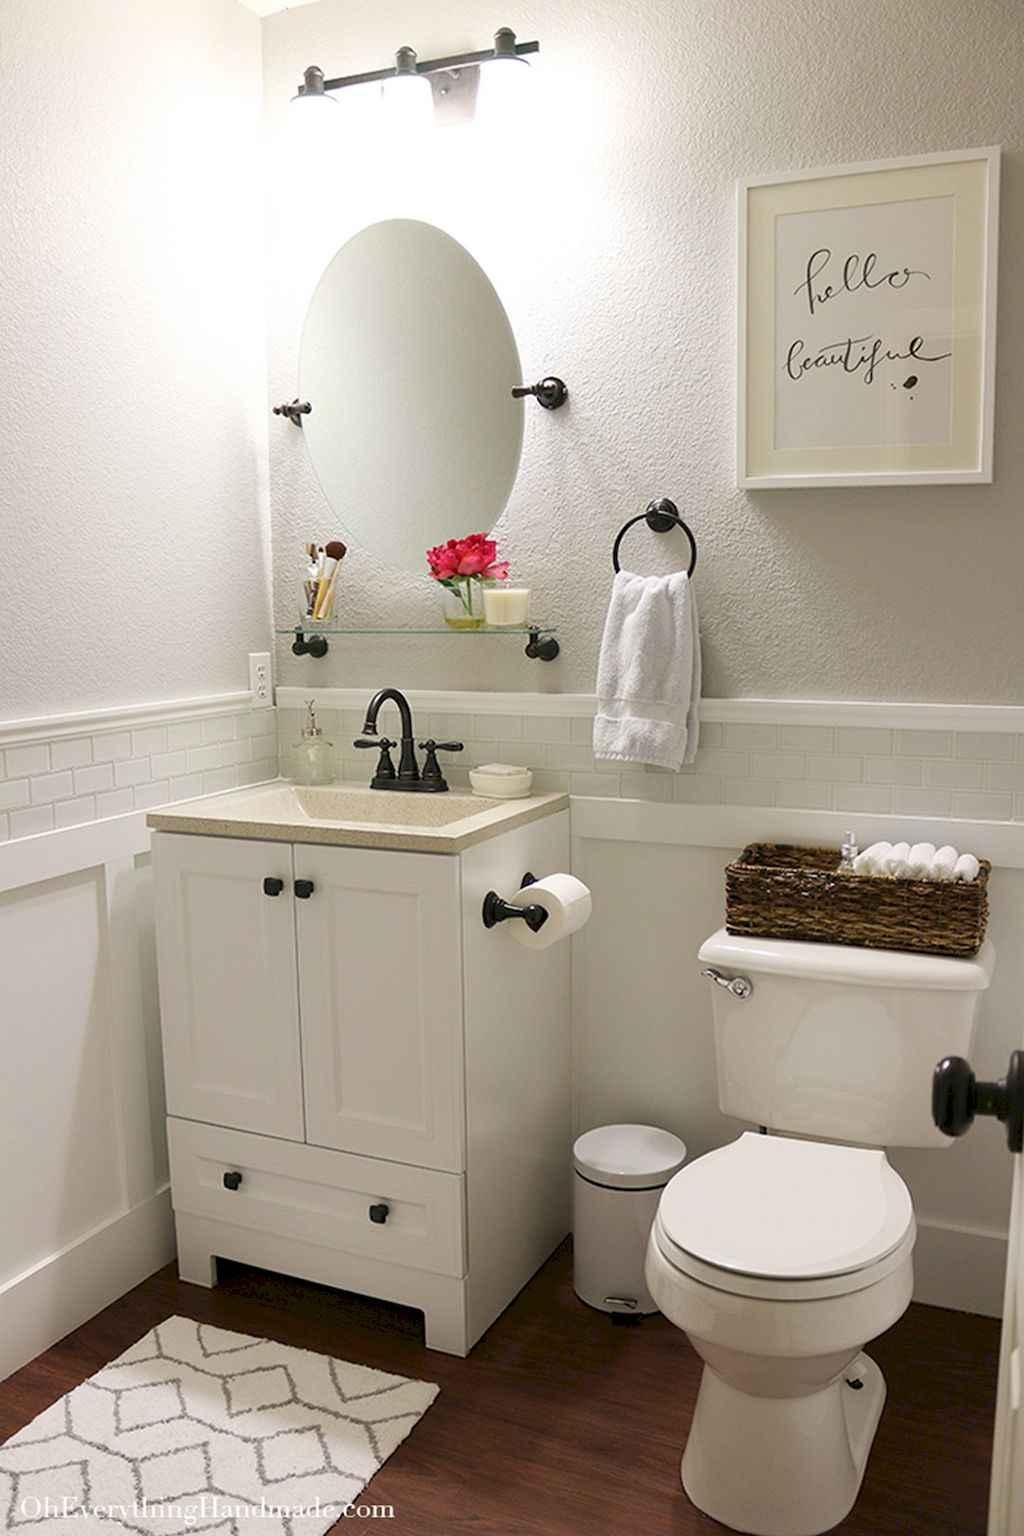 Inspiring apartment bathroom remodel ideas on a budget (29)